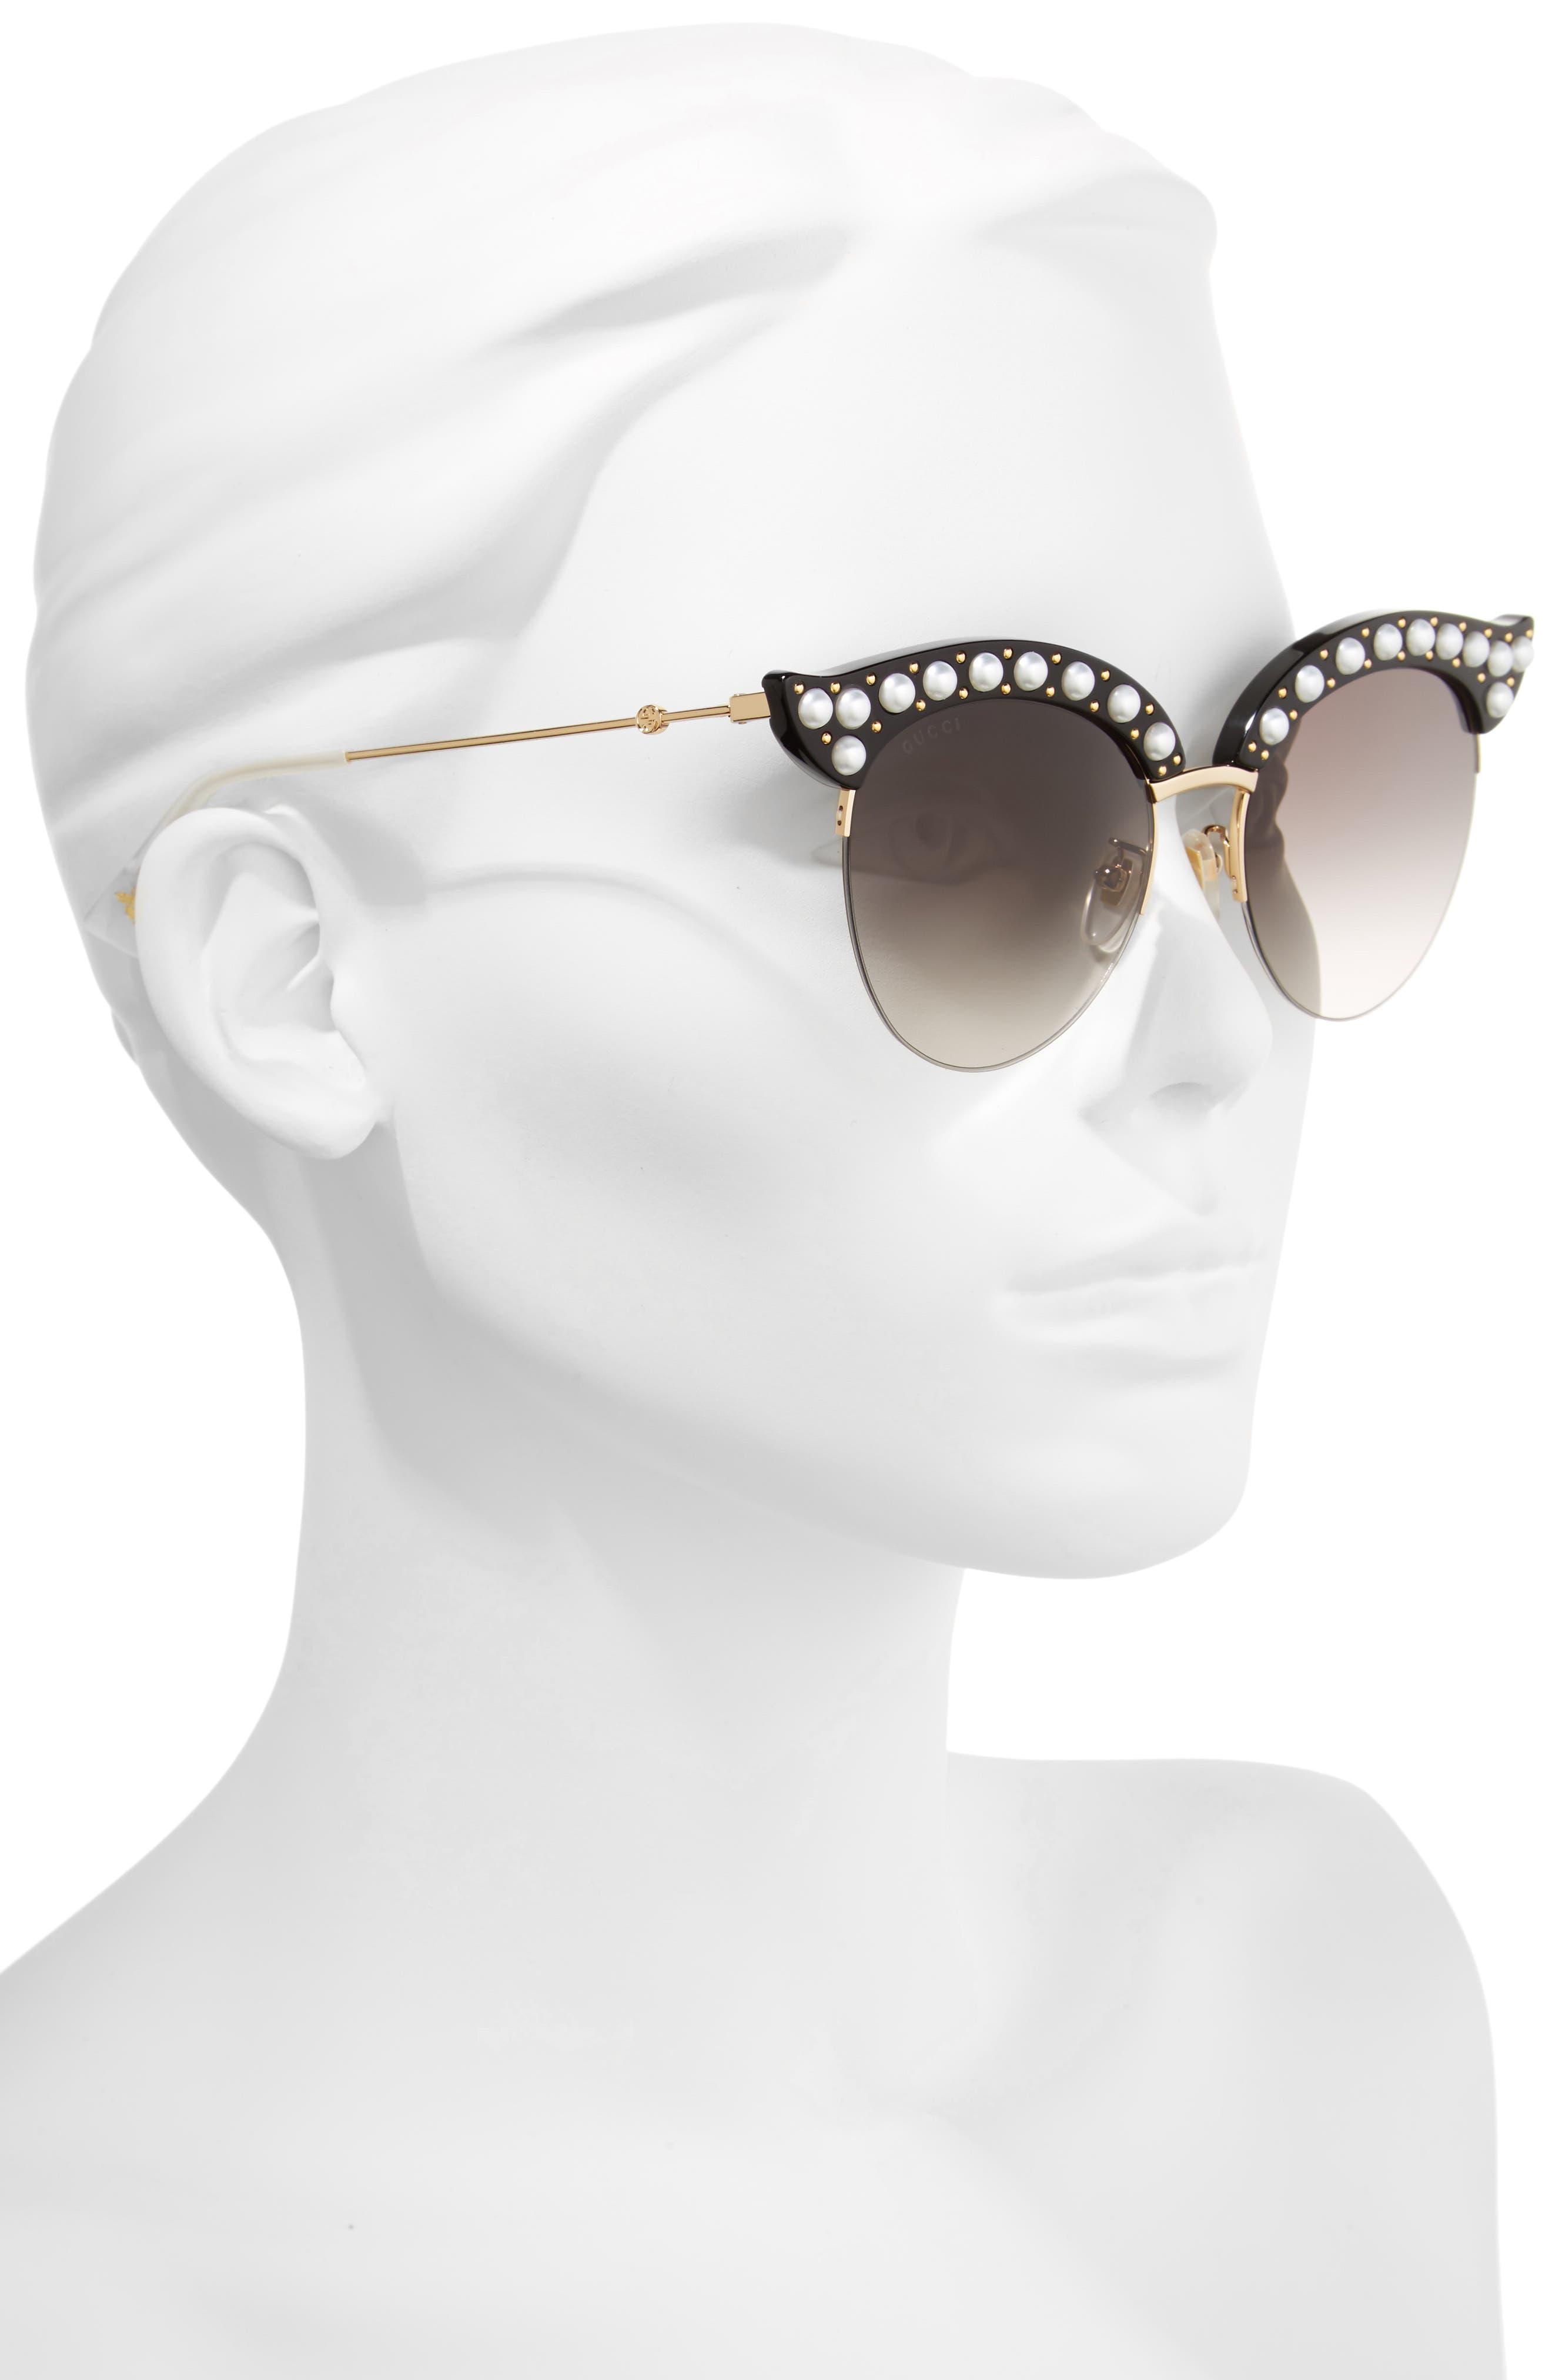 53mm Embellished Cat Eye Sunglasses,                             Alternate thumbnail 2, color,                             BLACK